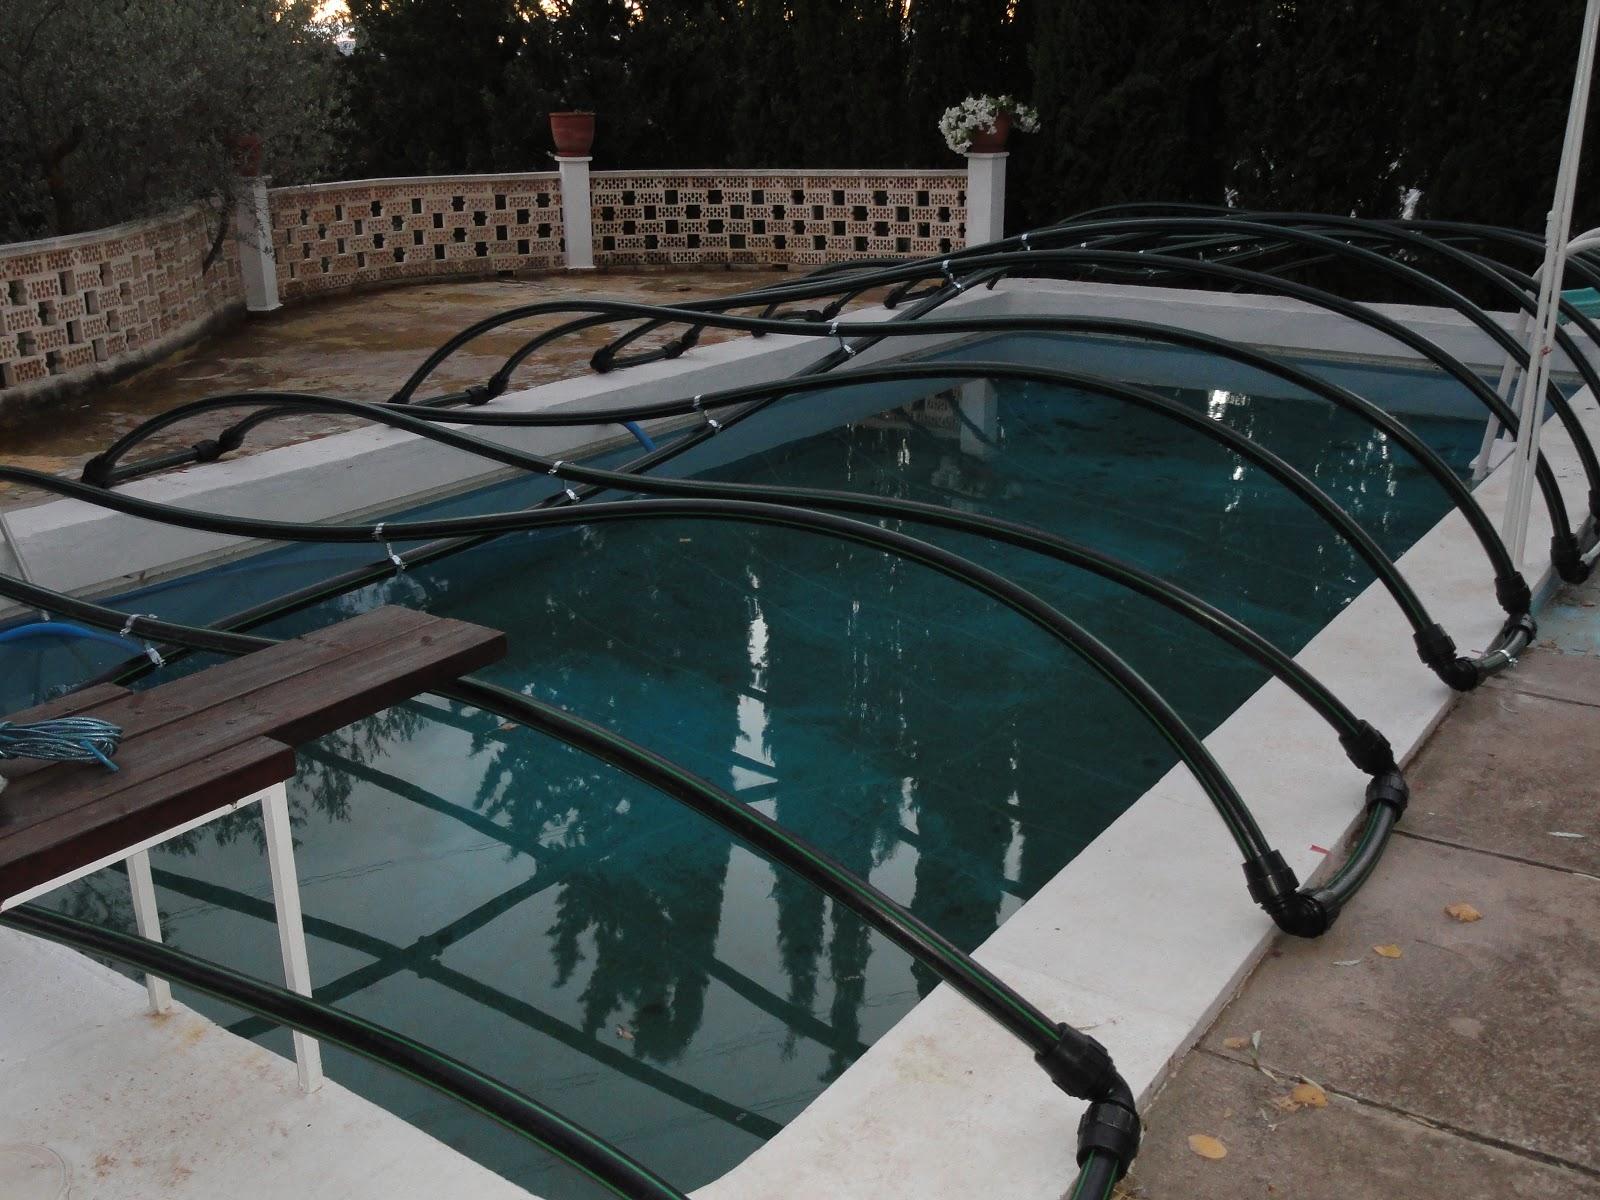 Como limpiar piscina de plastico elegant algas en paredes for Algas en piscinas de plastico